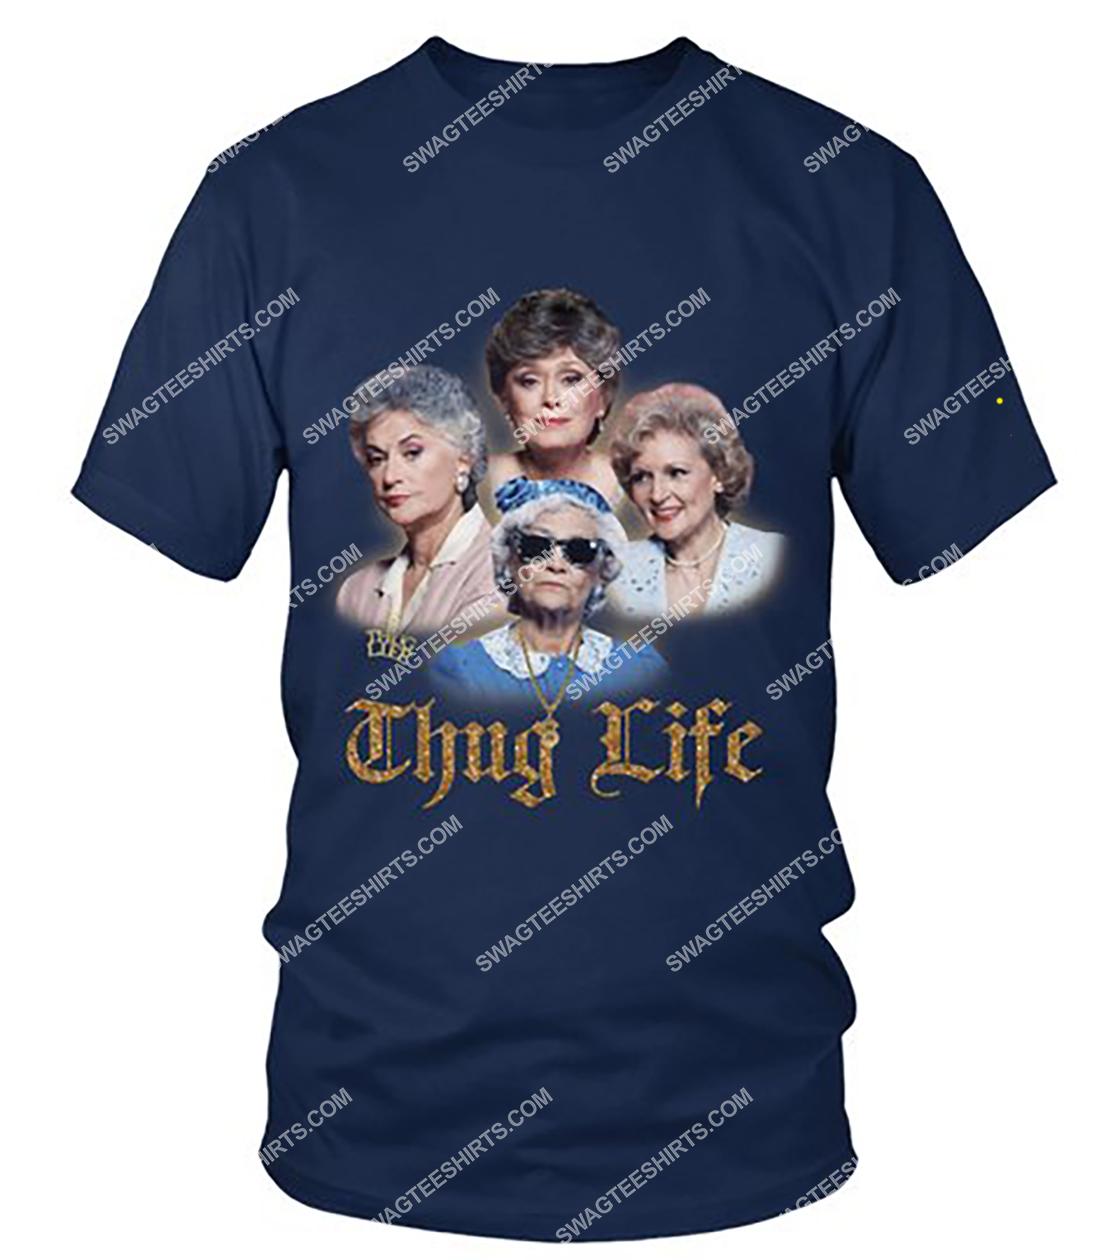 thug life the golden girls movie shirt 5(1)